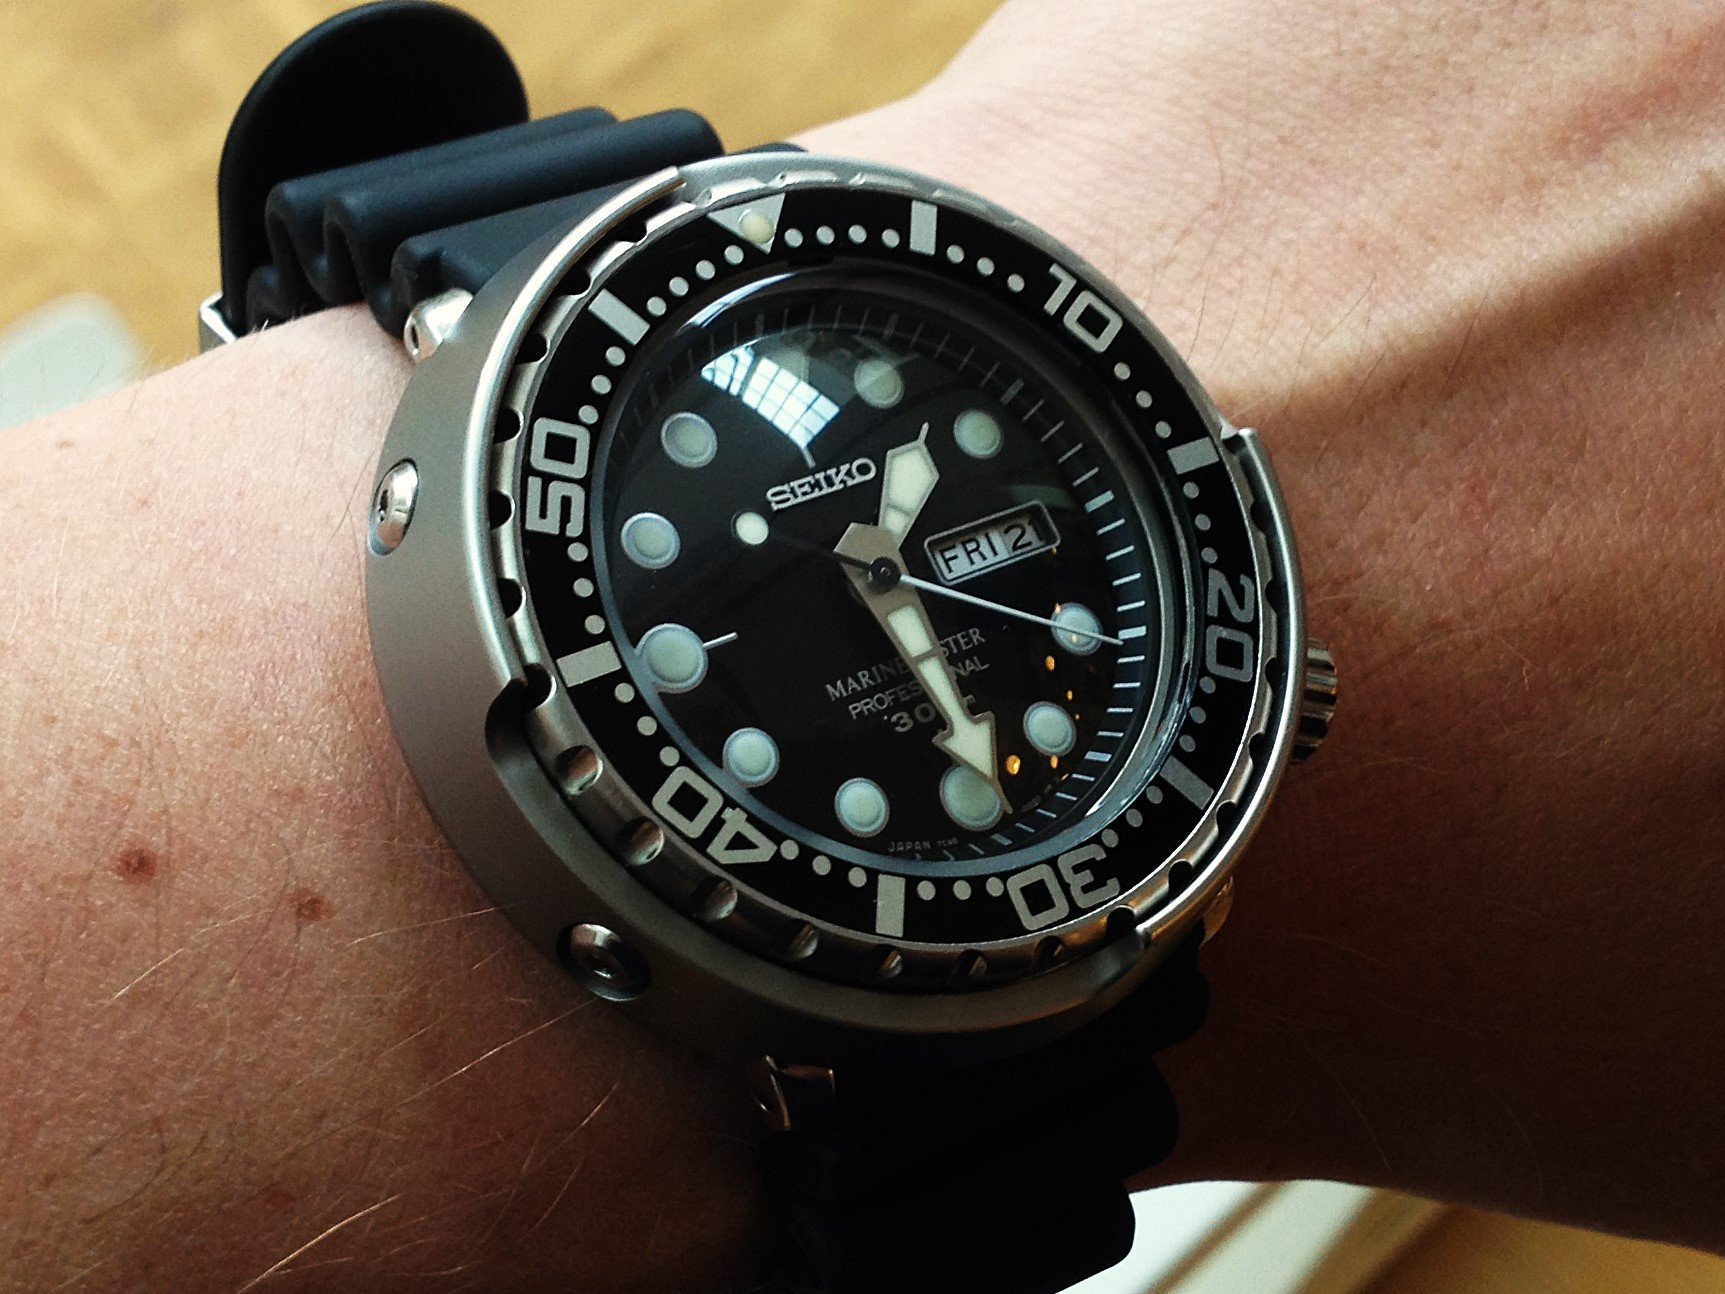 watch d4876 bc72c a watch flipper's diary: No 147 & 315 - Seiko SBBN017